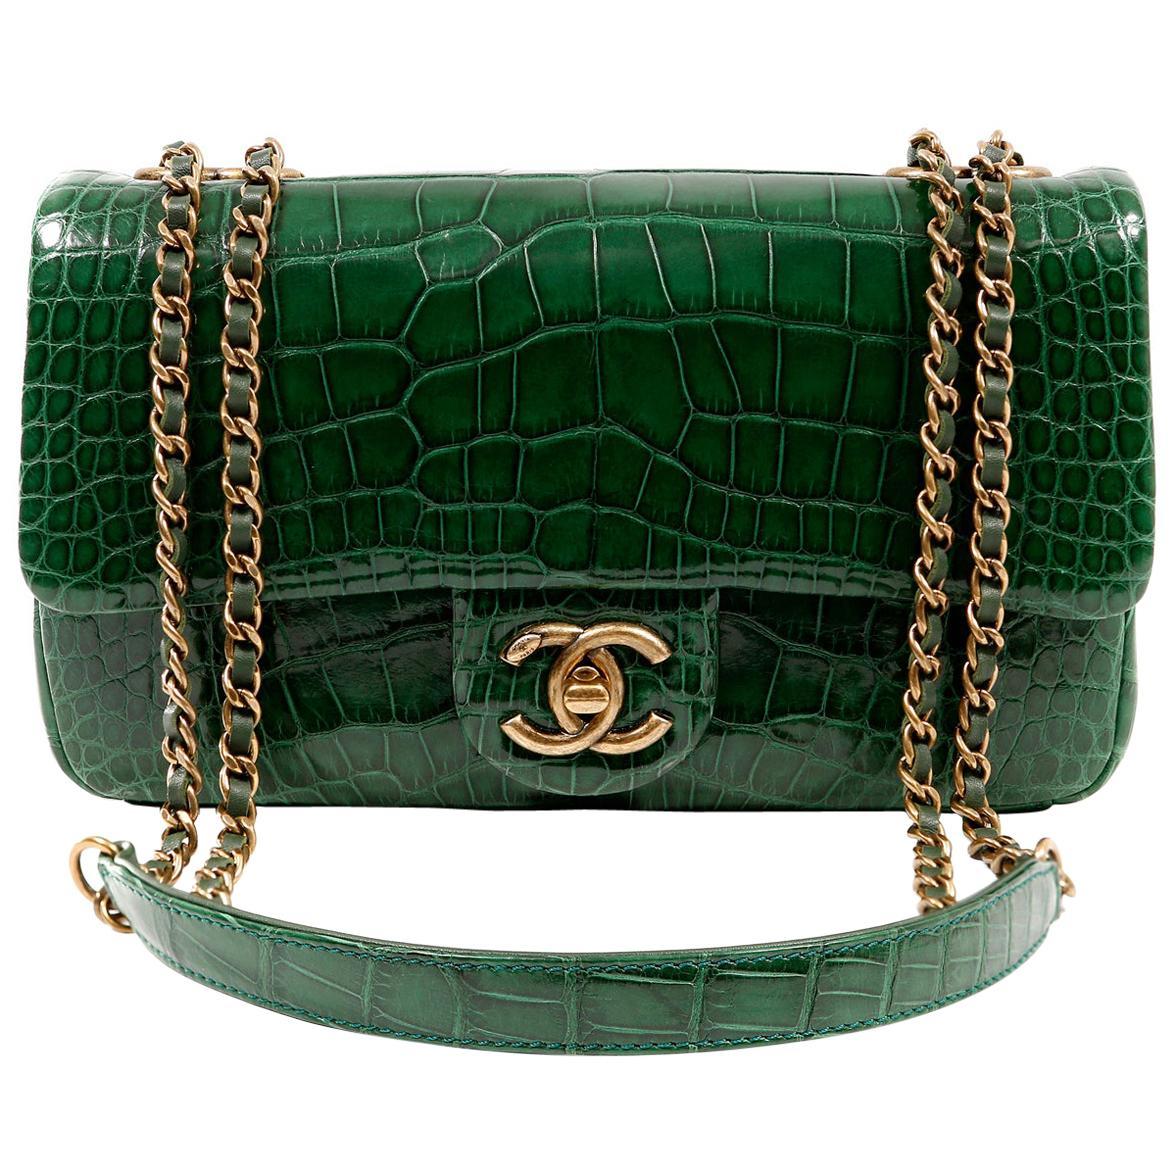 Chanel Emerald Green Alligator Medium Classic Flap Bag